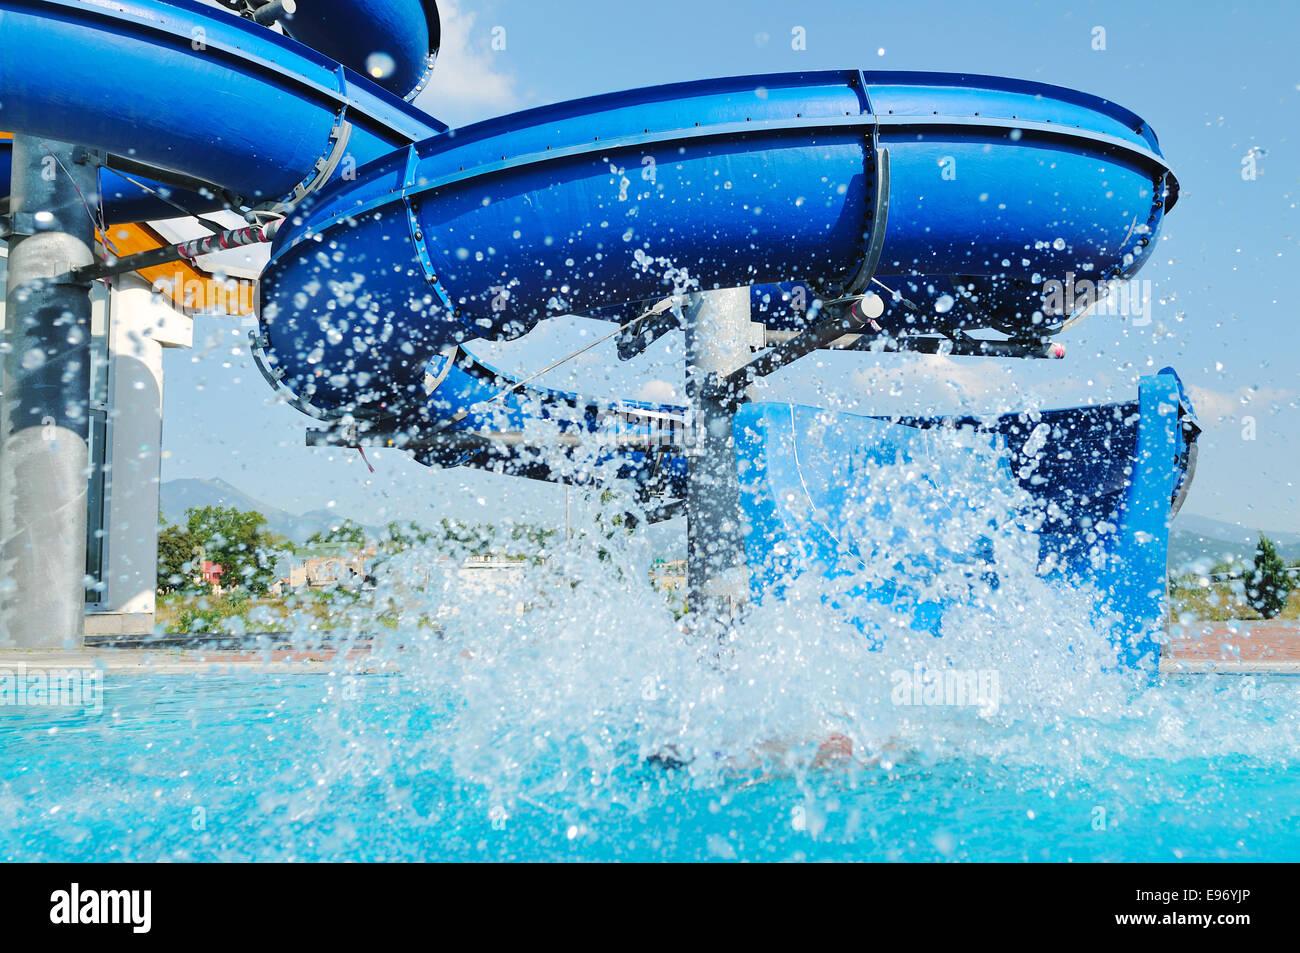 Water Slide Fun On Outdoor Pool Stock Photo Royalty Free Image 74526782 Alamy